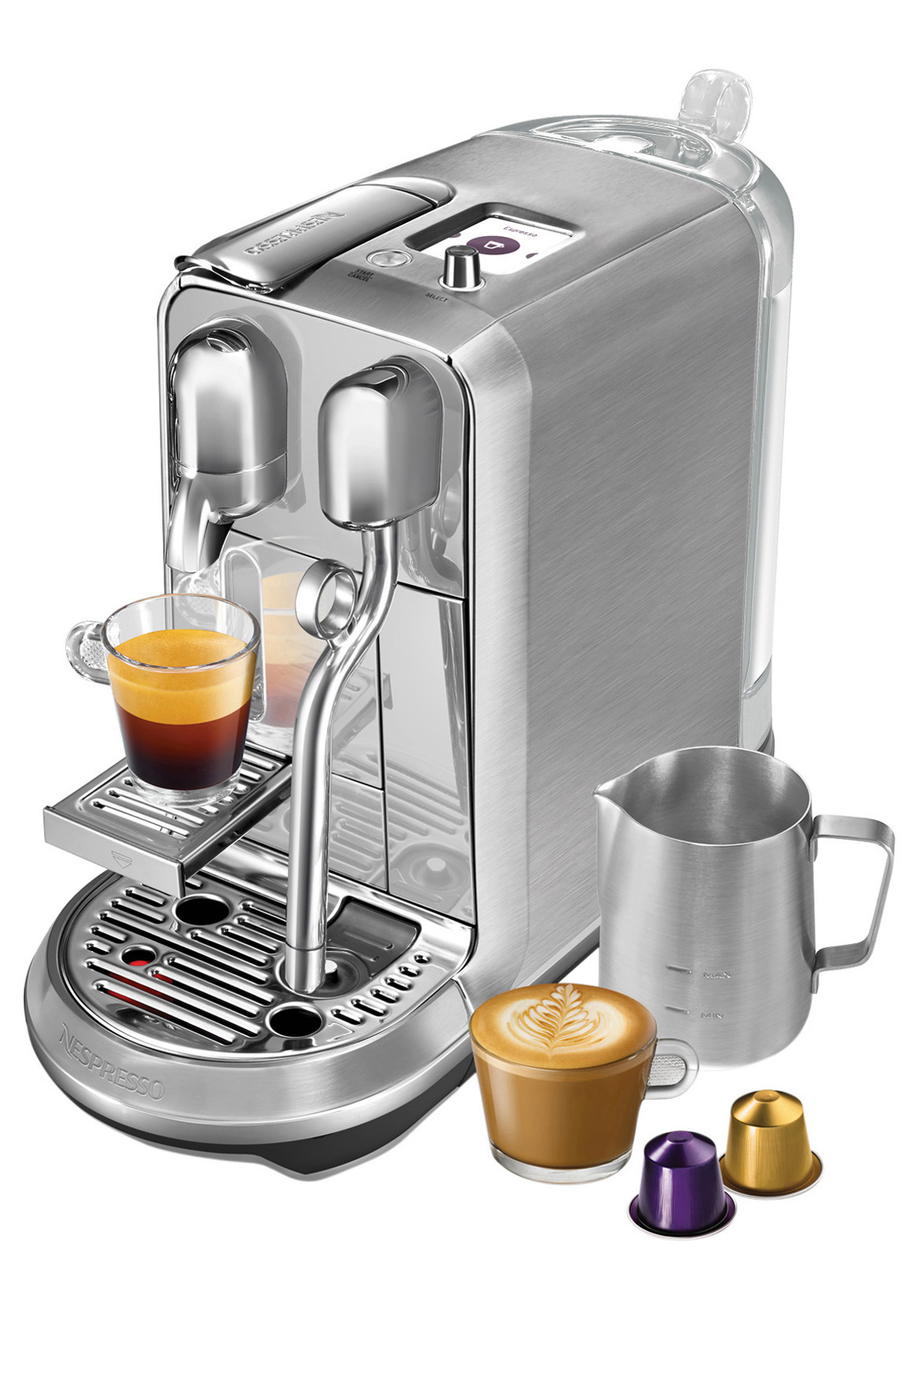 Breville Nespresso Creatista Plus Bne800 Reviews Productreview Com Au